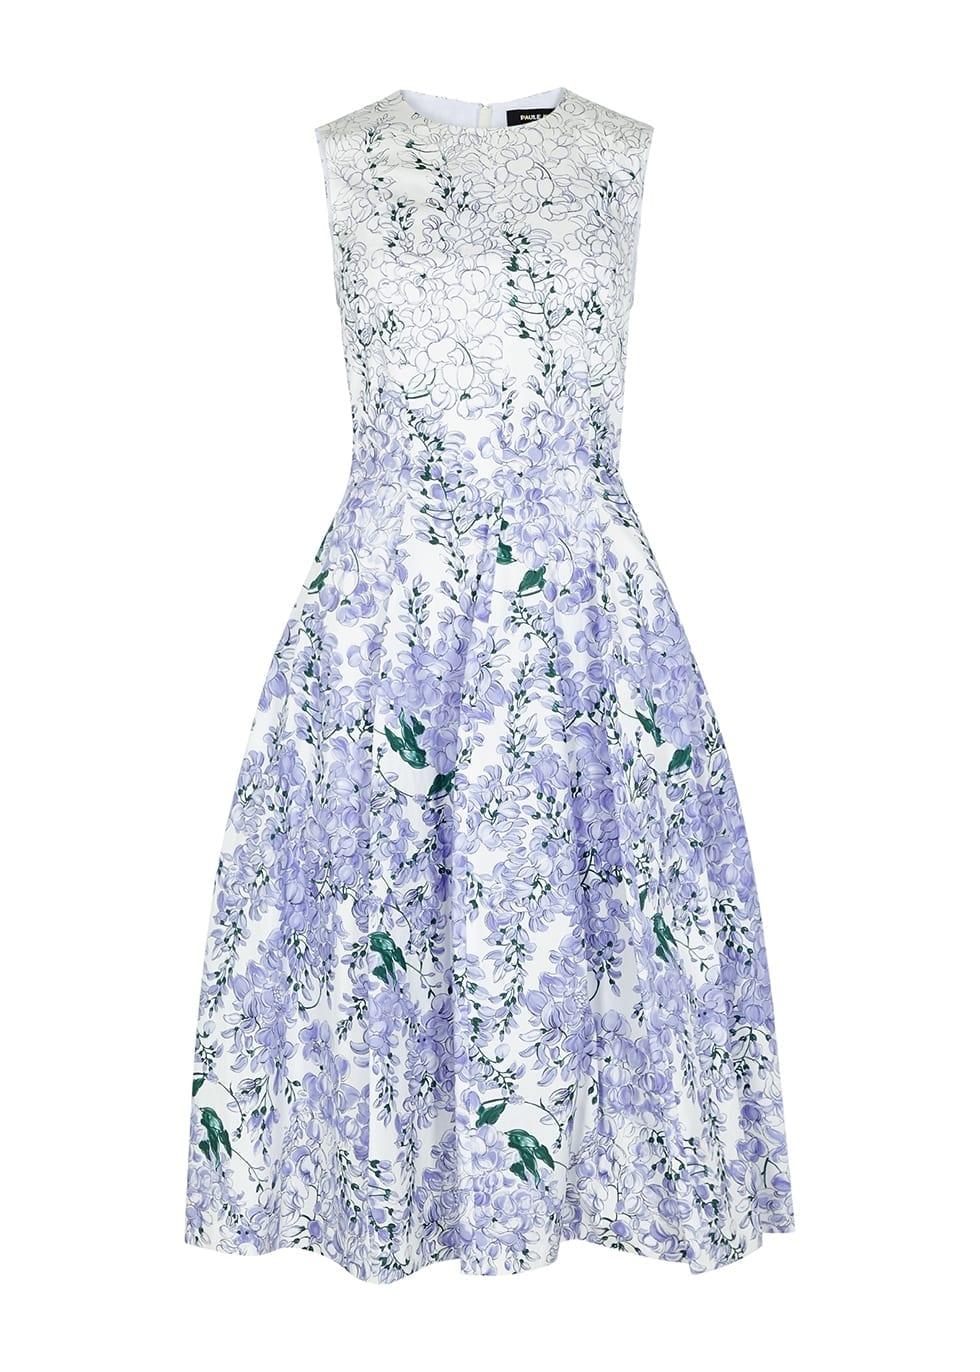 PAULE KA Floral-print Stretch-cotton Dress